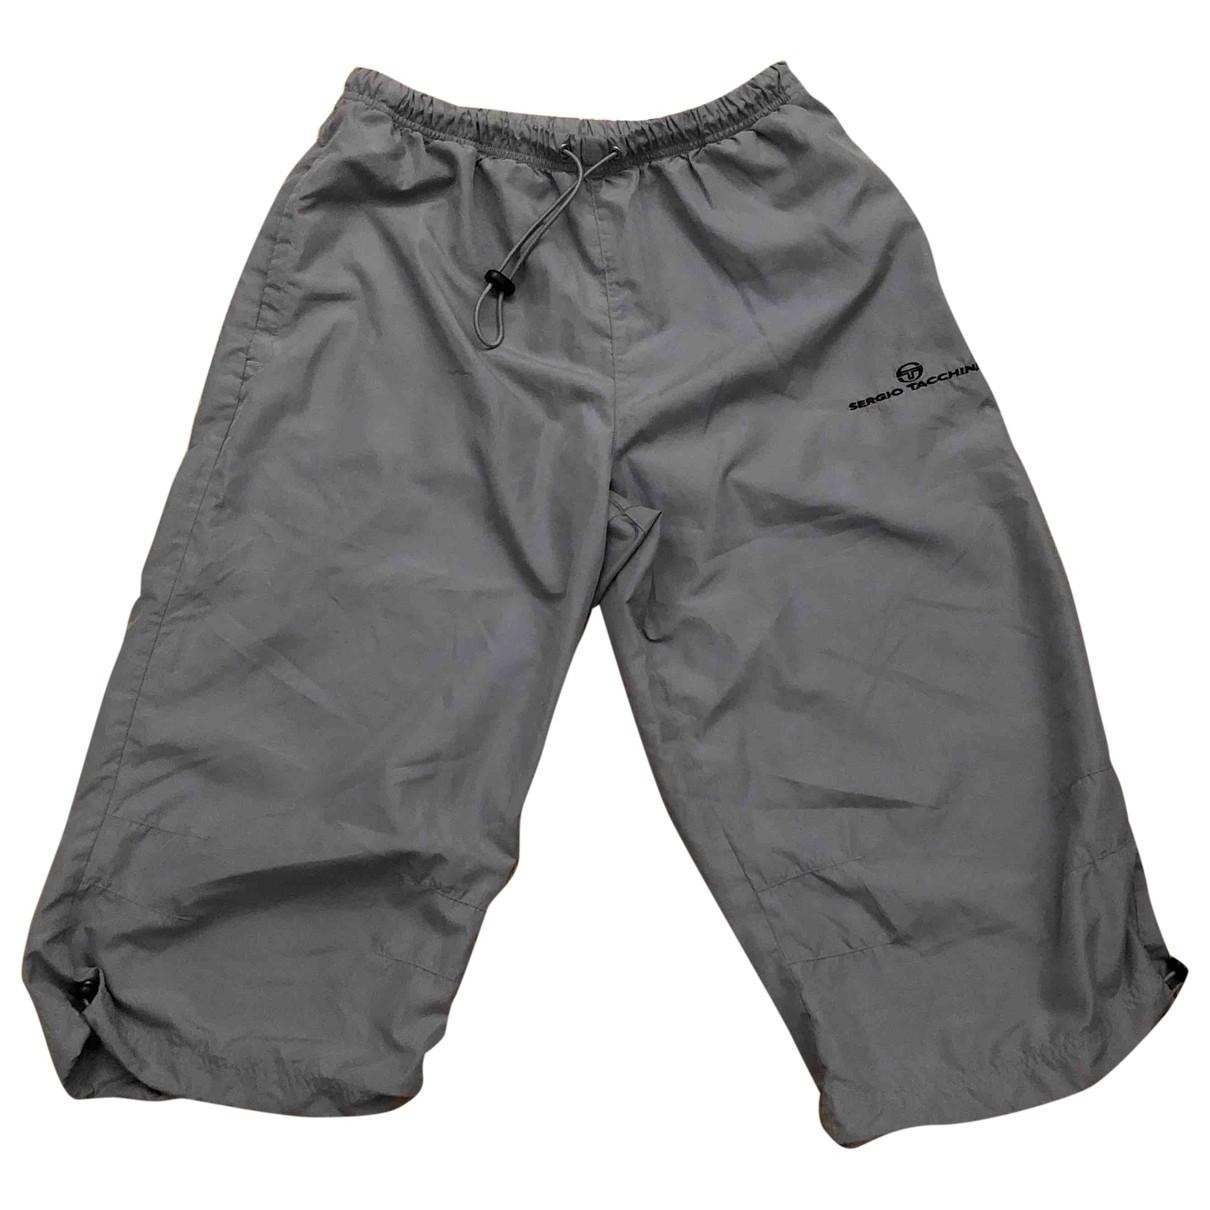 Sergio Tacchini \N Grey Trousers for Men L International